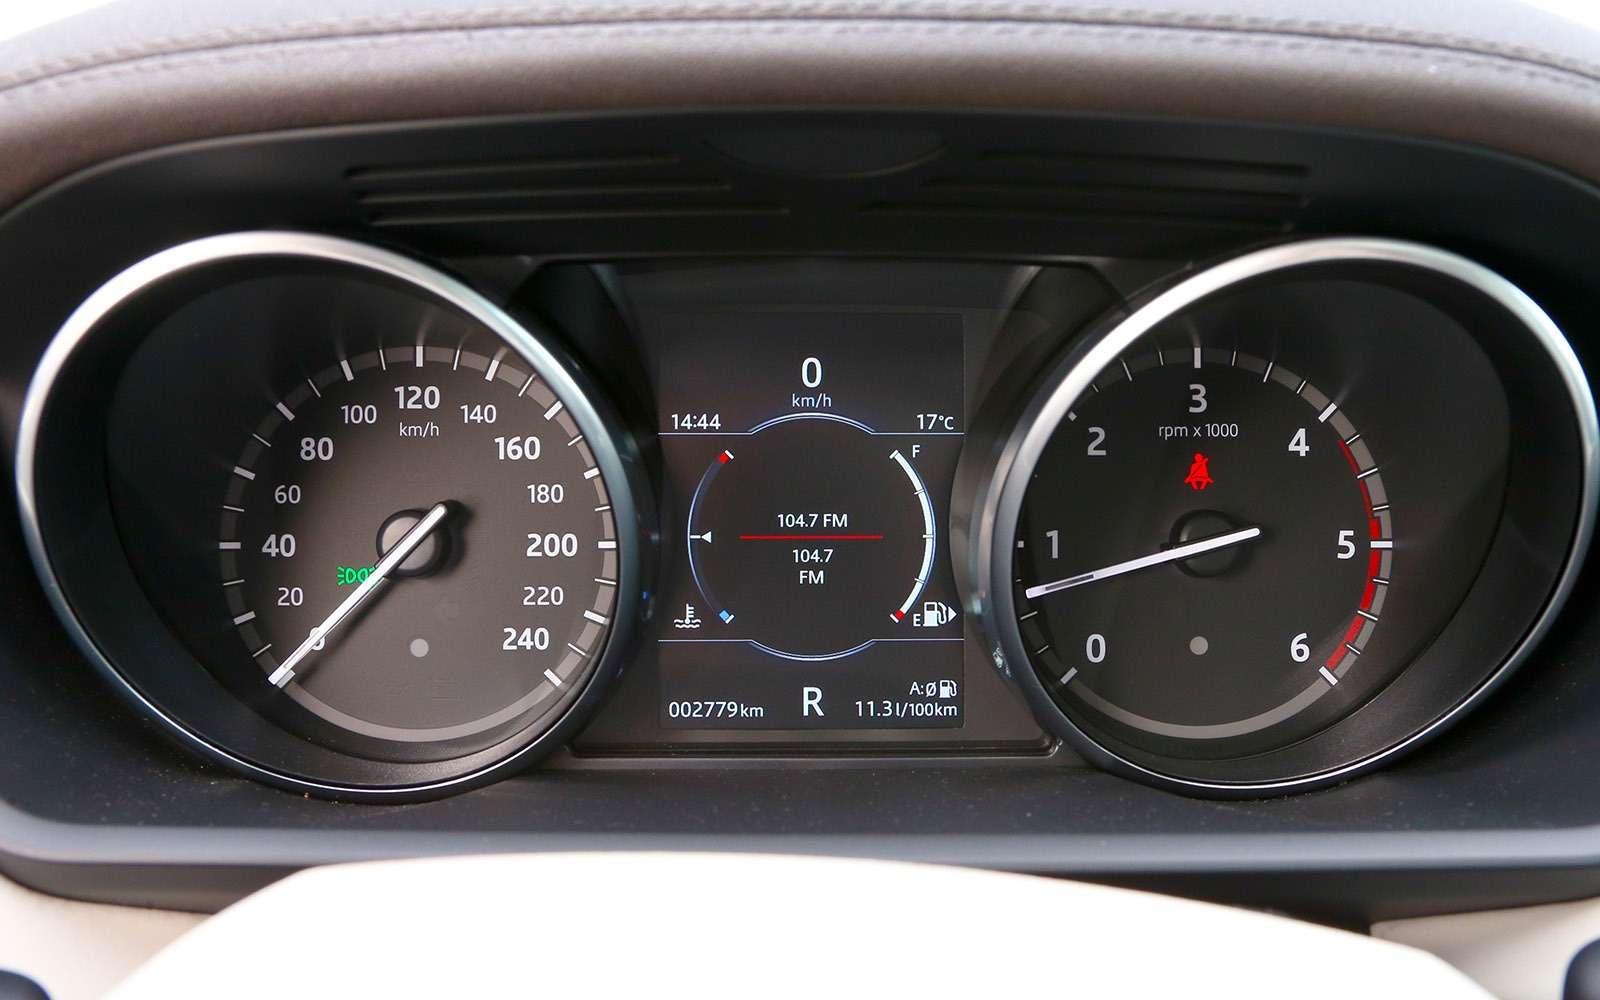 Новый Land Rover Discovery против конкурентов— тест ЗР— фото 784659